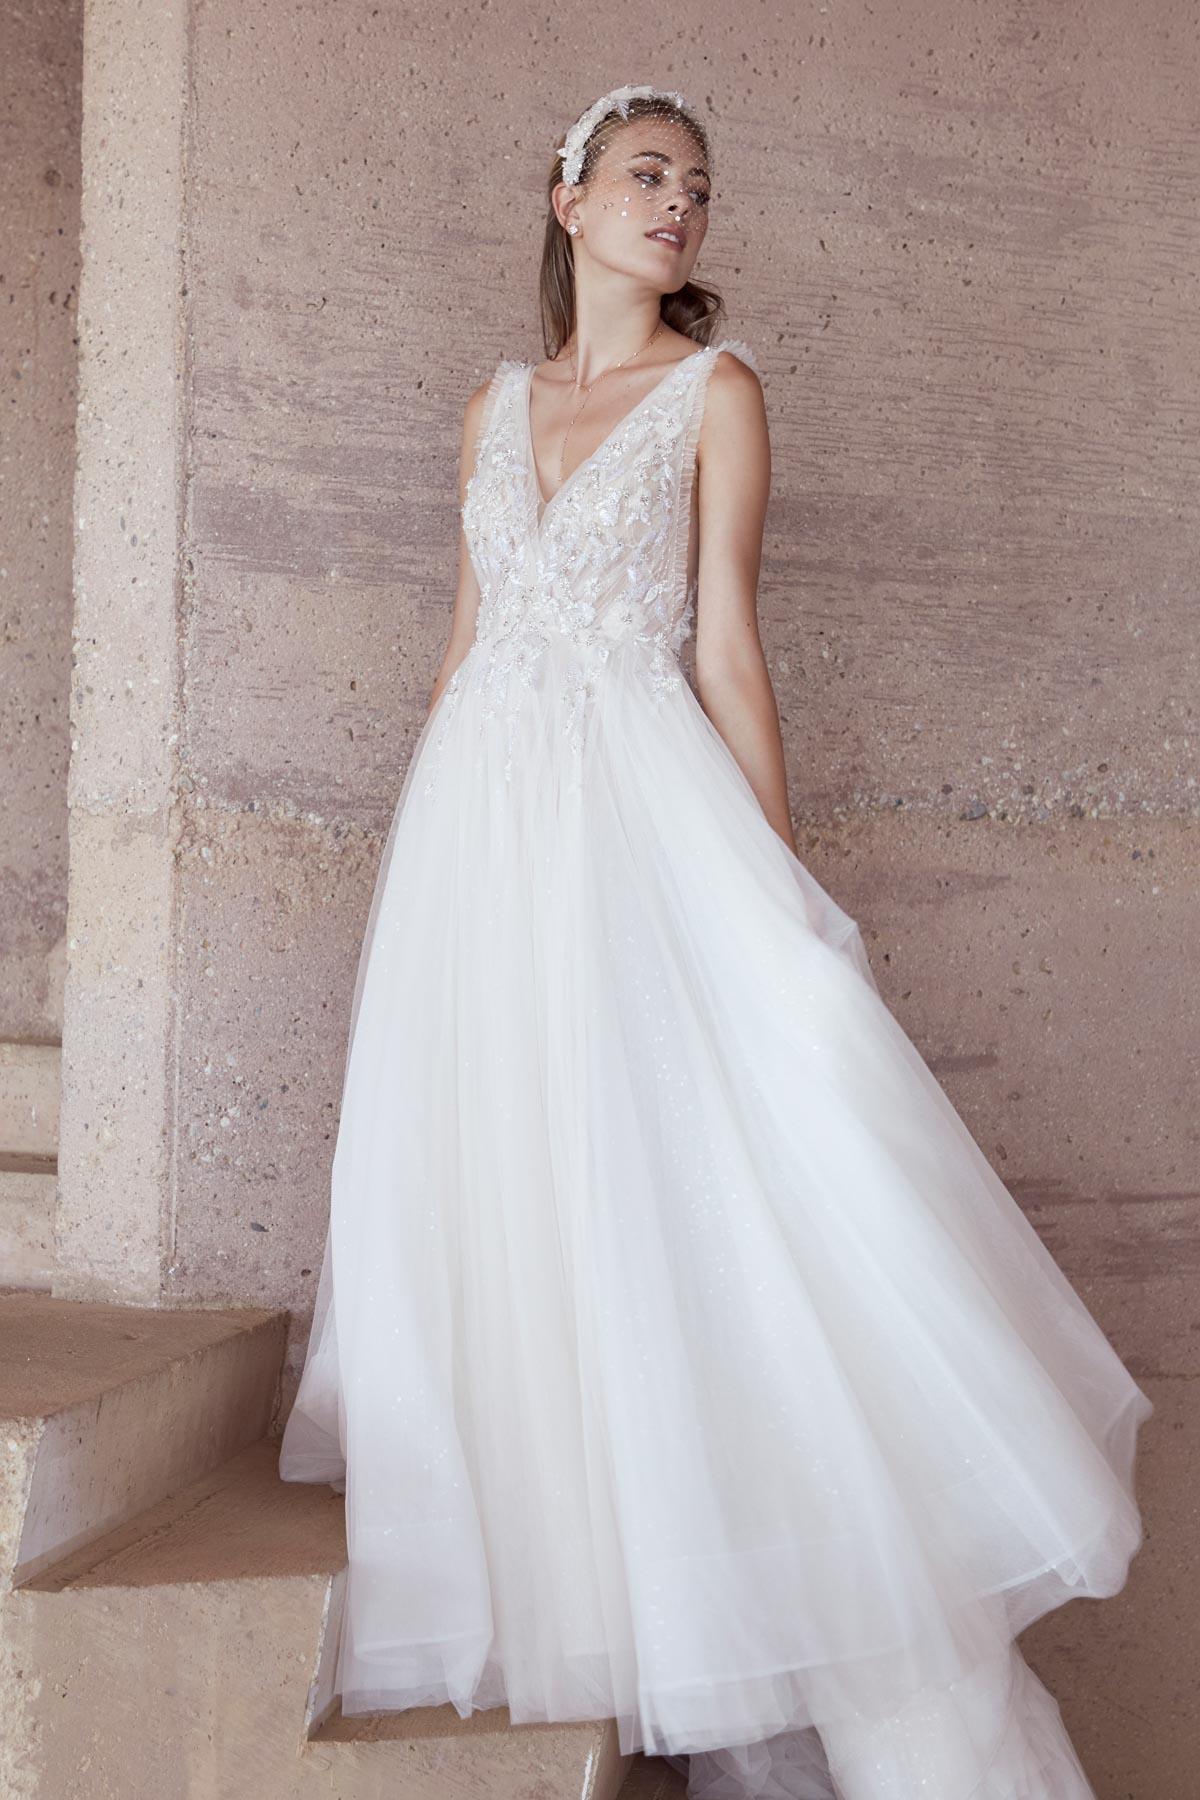 Felichia Bridal Wedding Dresses Toronto Bridal Boutique,Wedding Dresses 2020 Lace